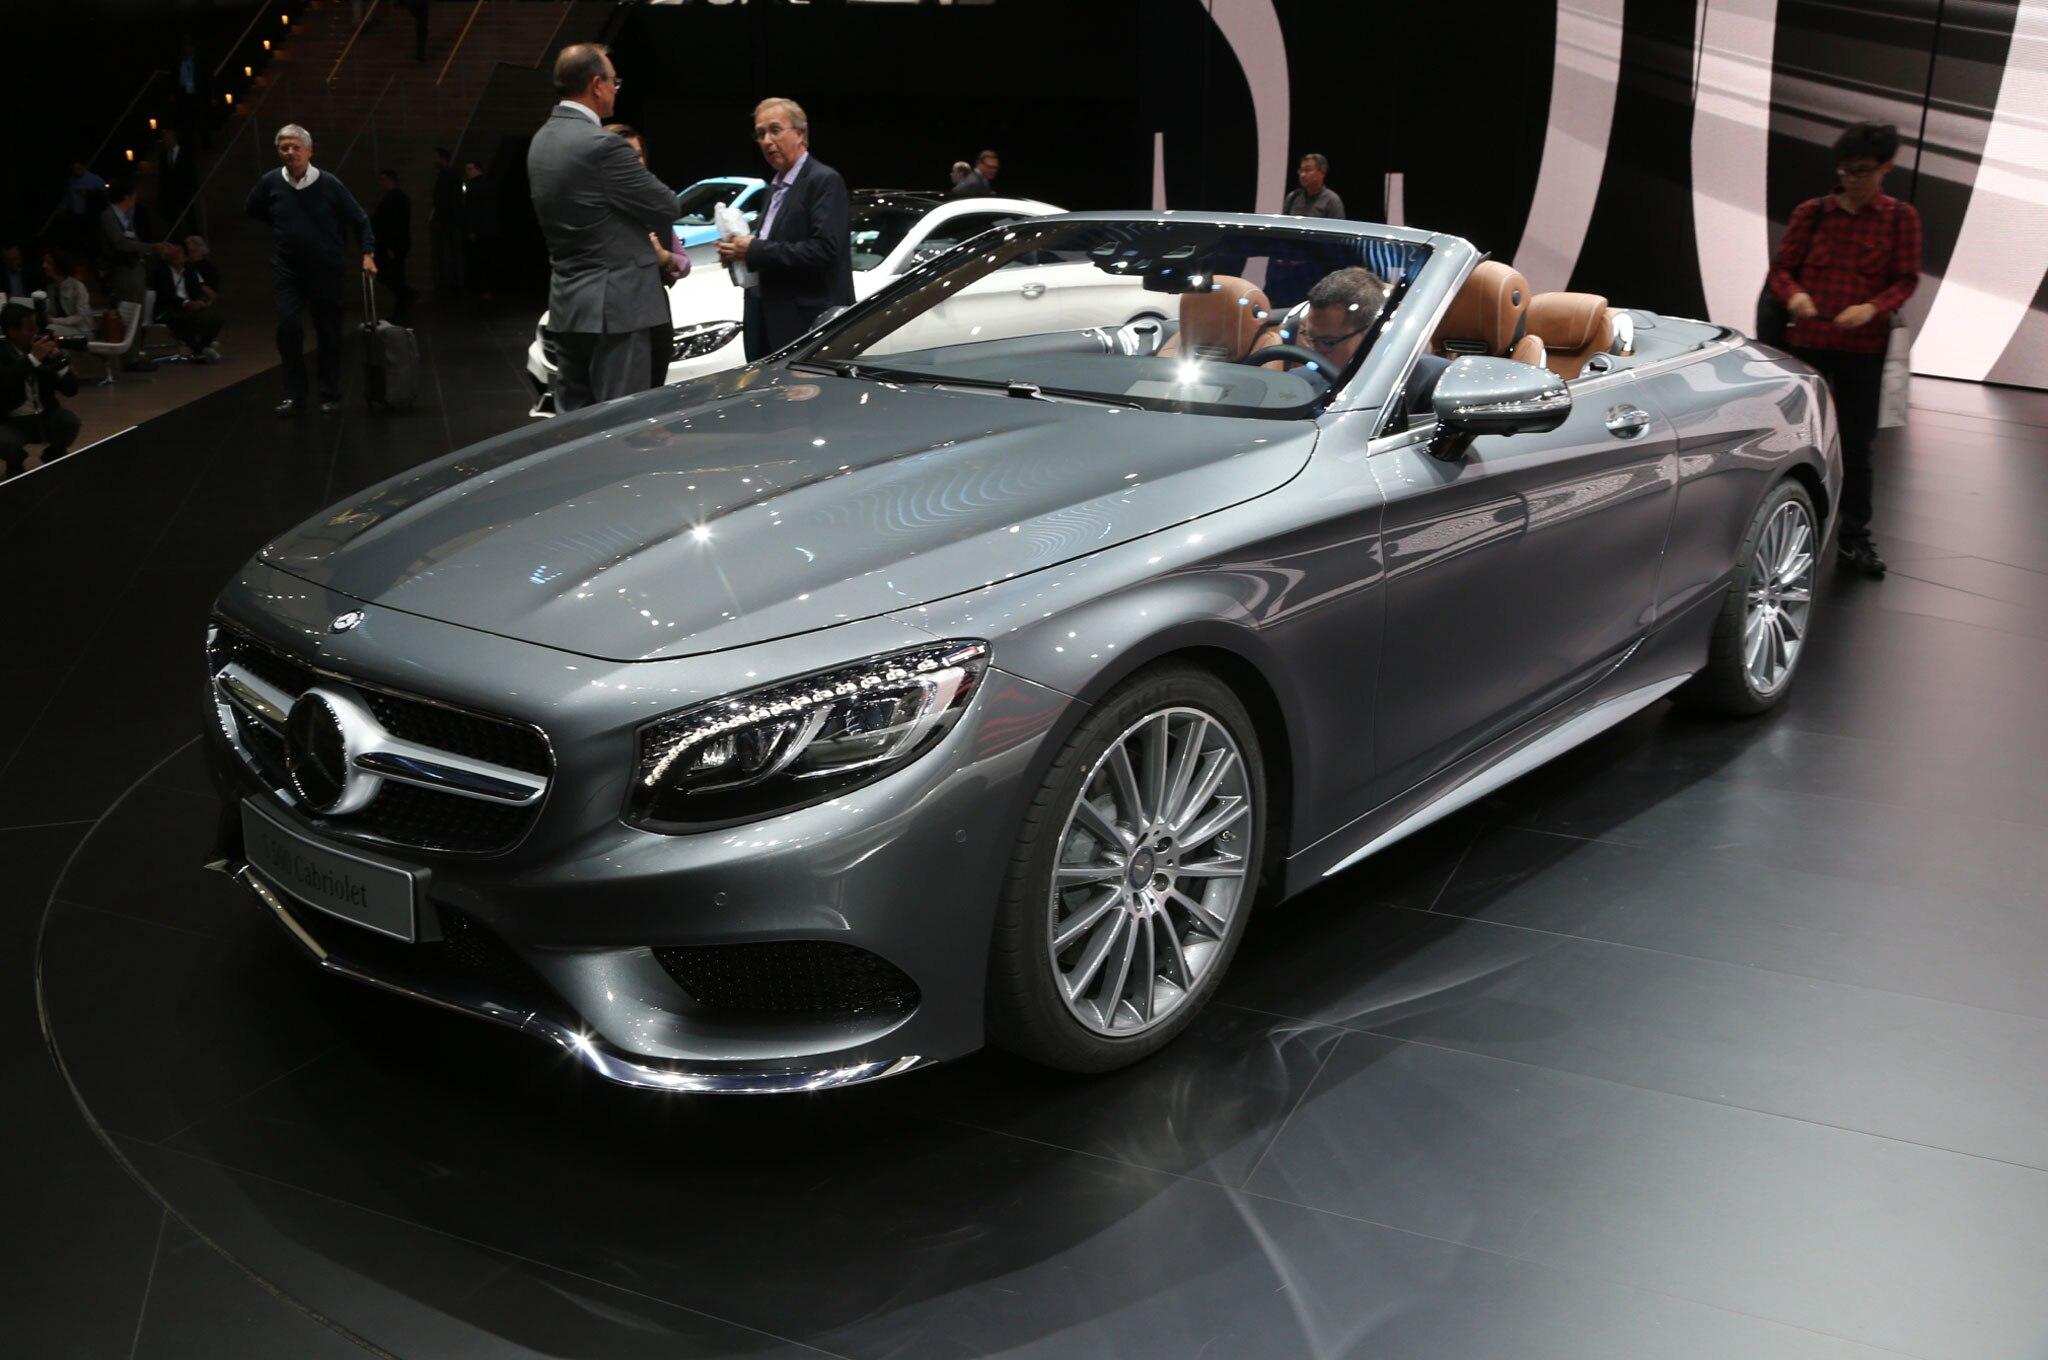 http://st.automobilemag.com/uploads/sites/11/2015/09/Mercedes-Benz-S500-Cabriolet-front-three-quarter.jpg